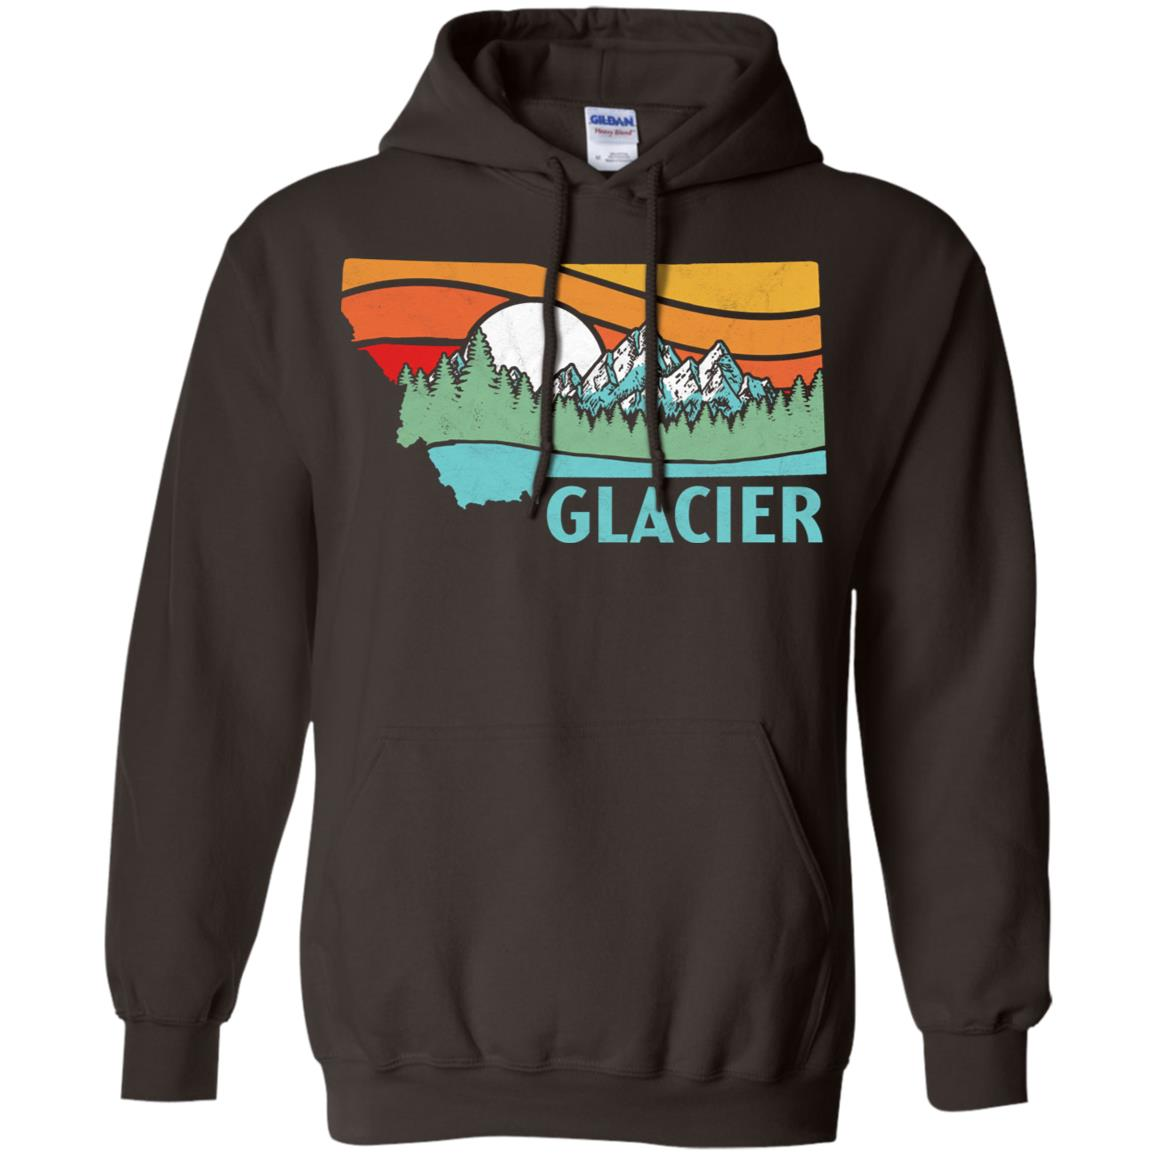 Glacier National Park Montana Outdoors Retro Tee Pullover Hoodie